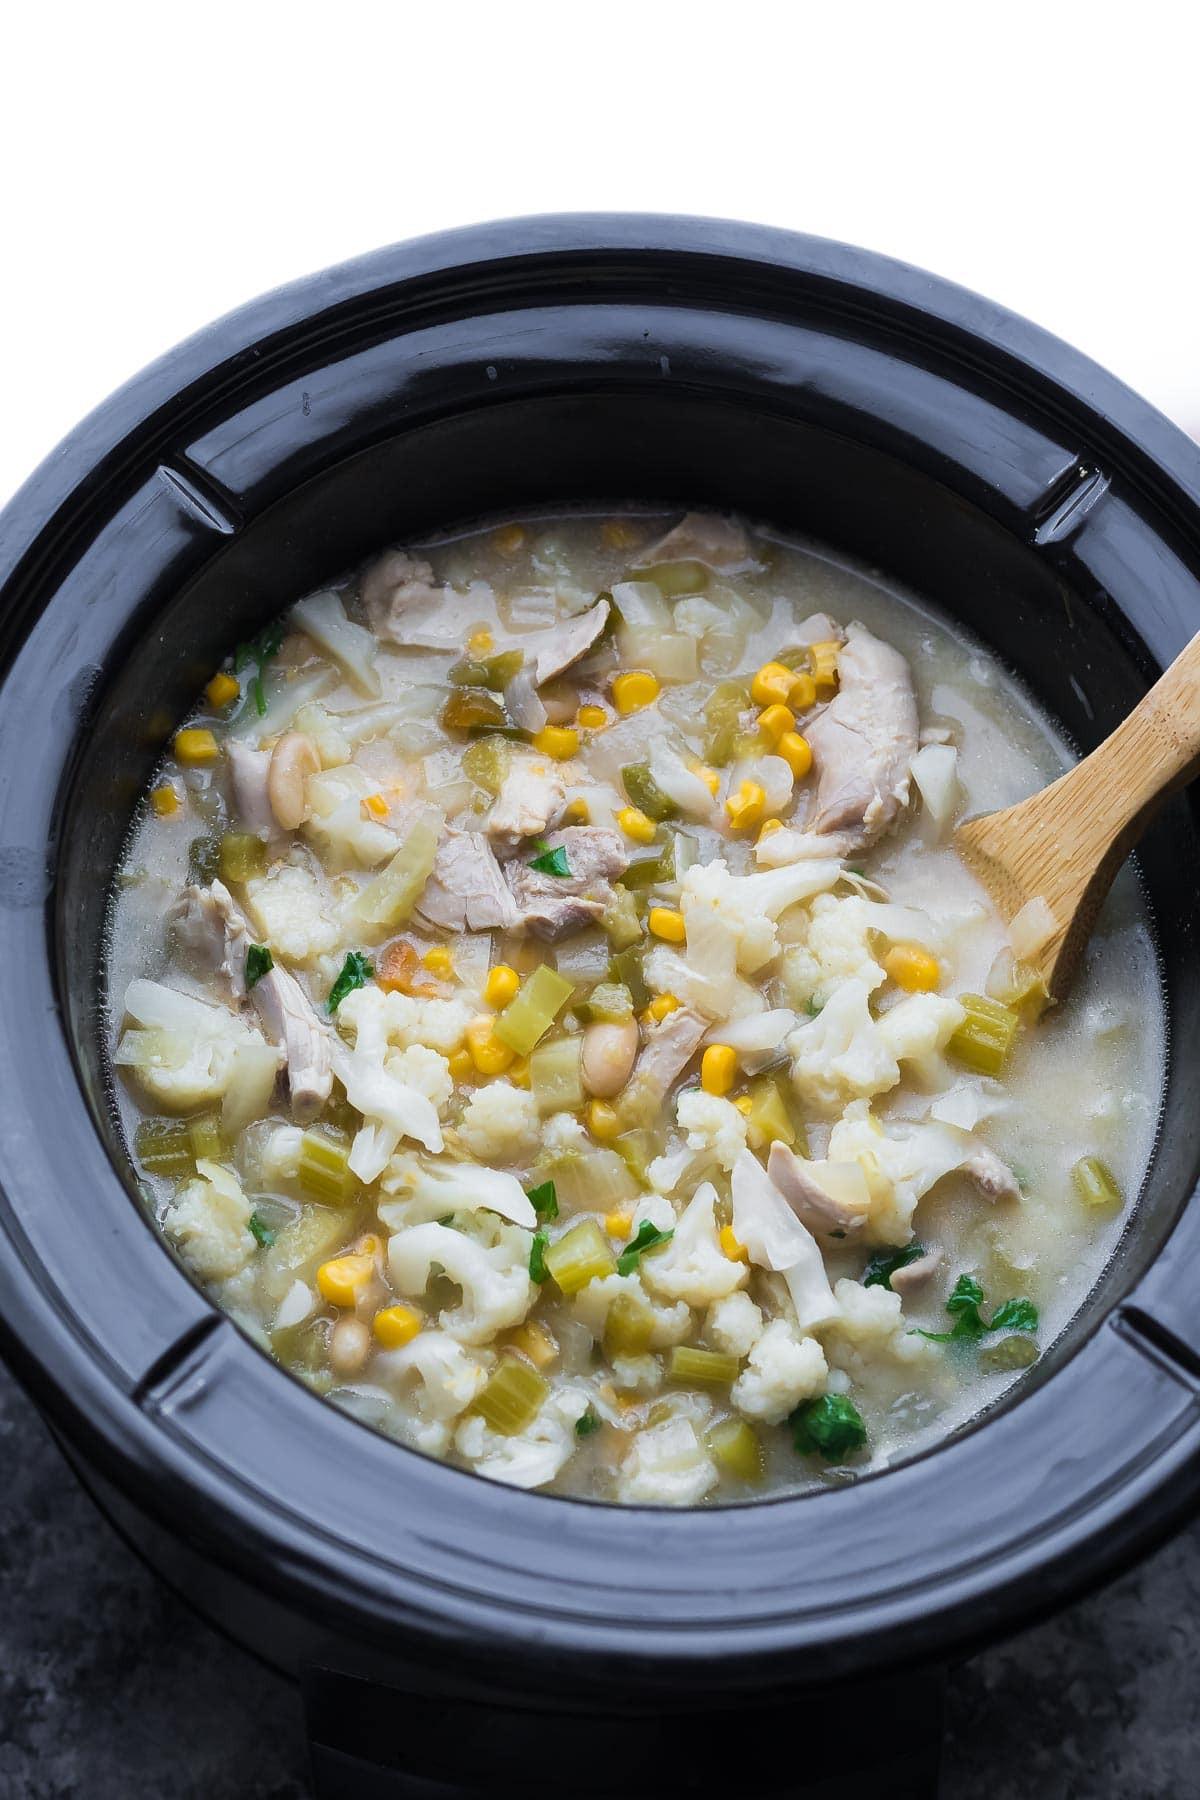 Healthy Crockpot White Chicken Chili  Healthy Slow Cooker White Chicken Chili Freezer to Crock